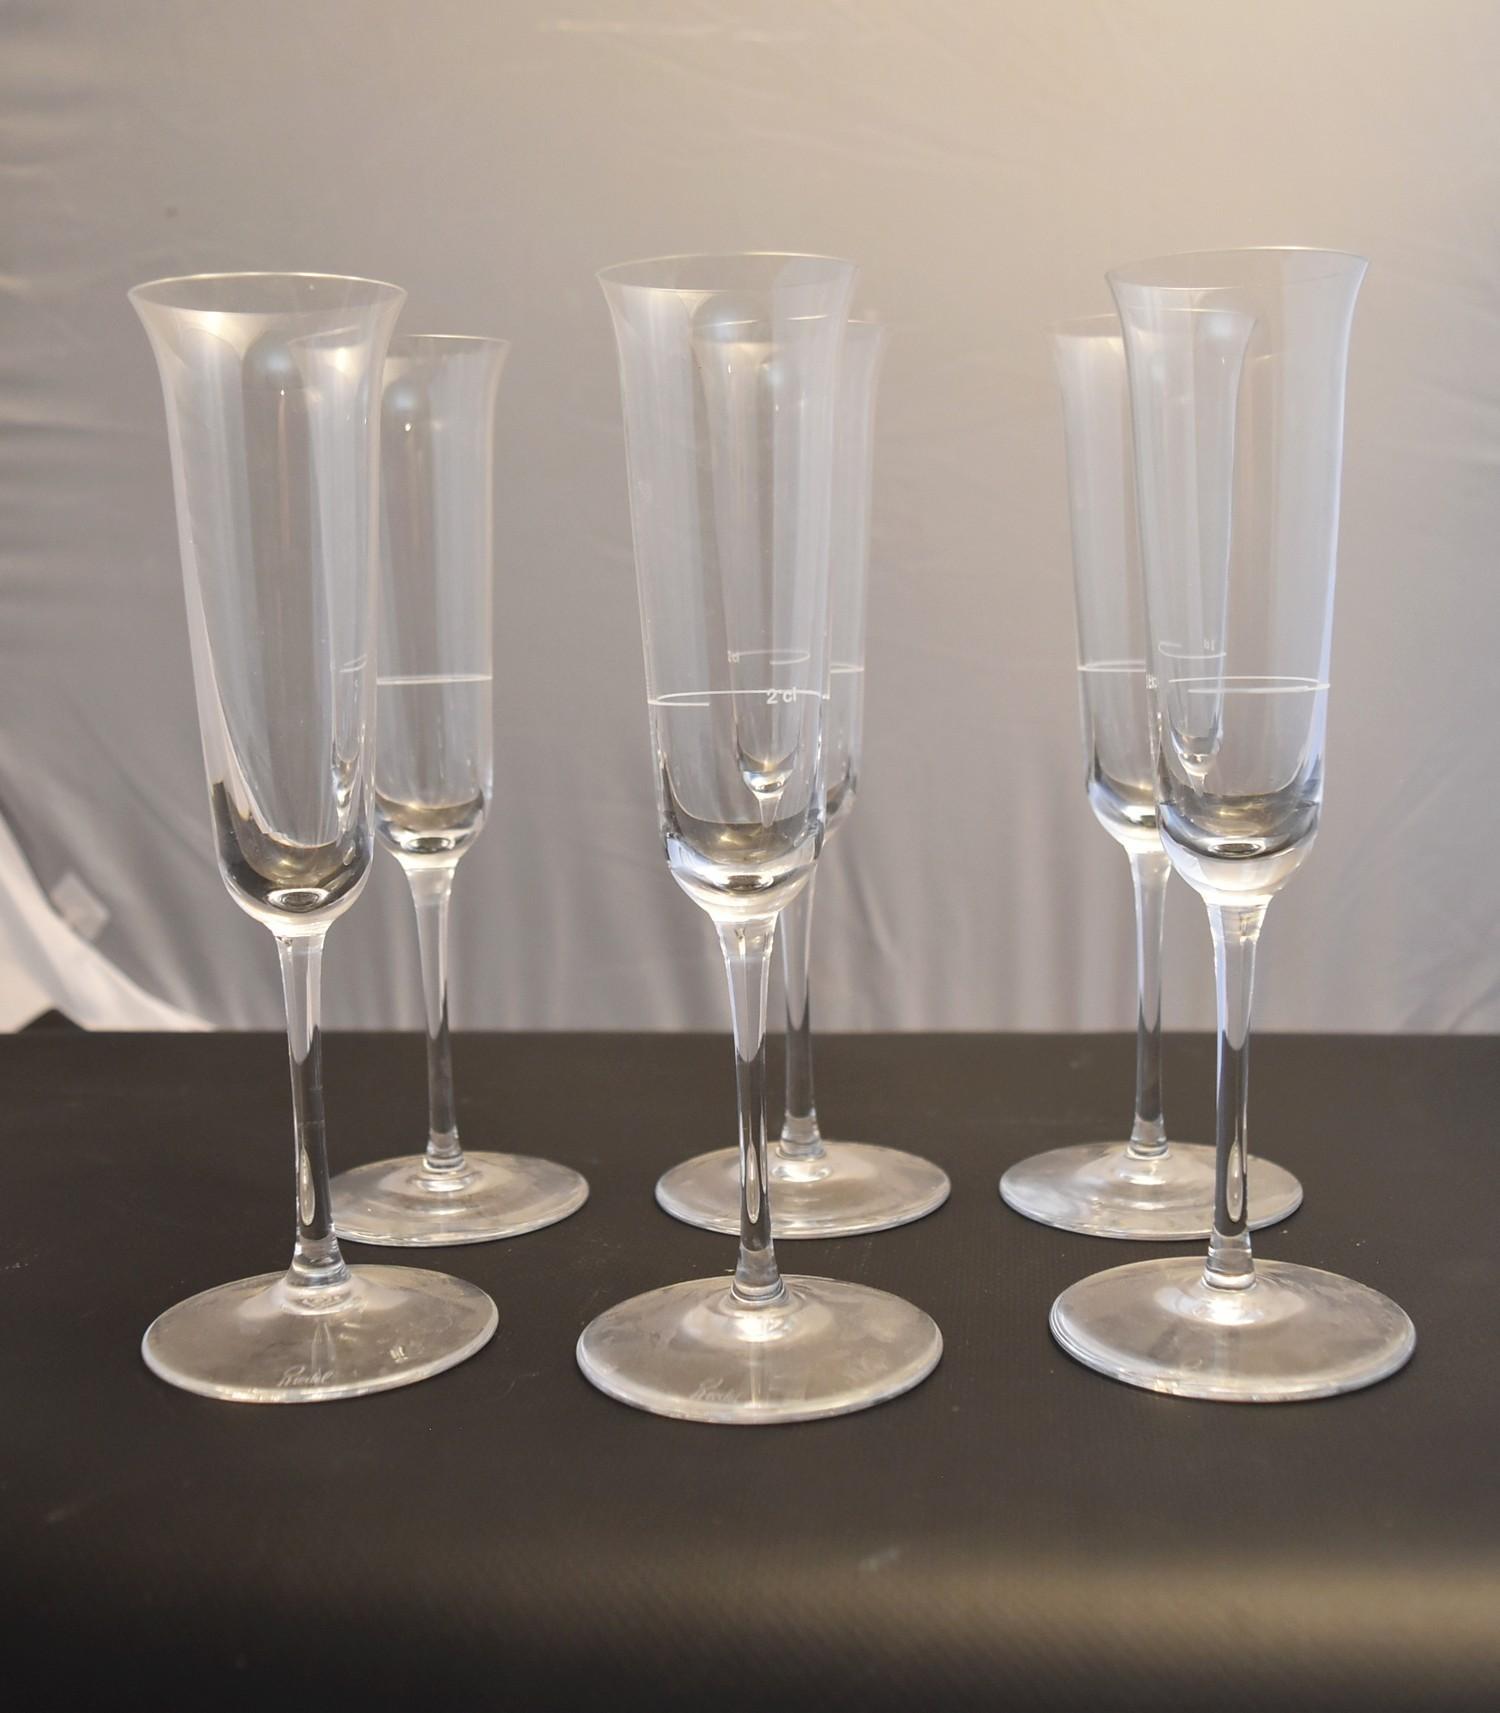 Lot 17 - A set of six Reidel champagne flutes. H20cm